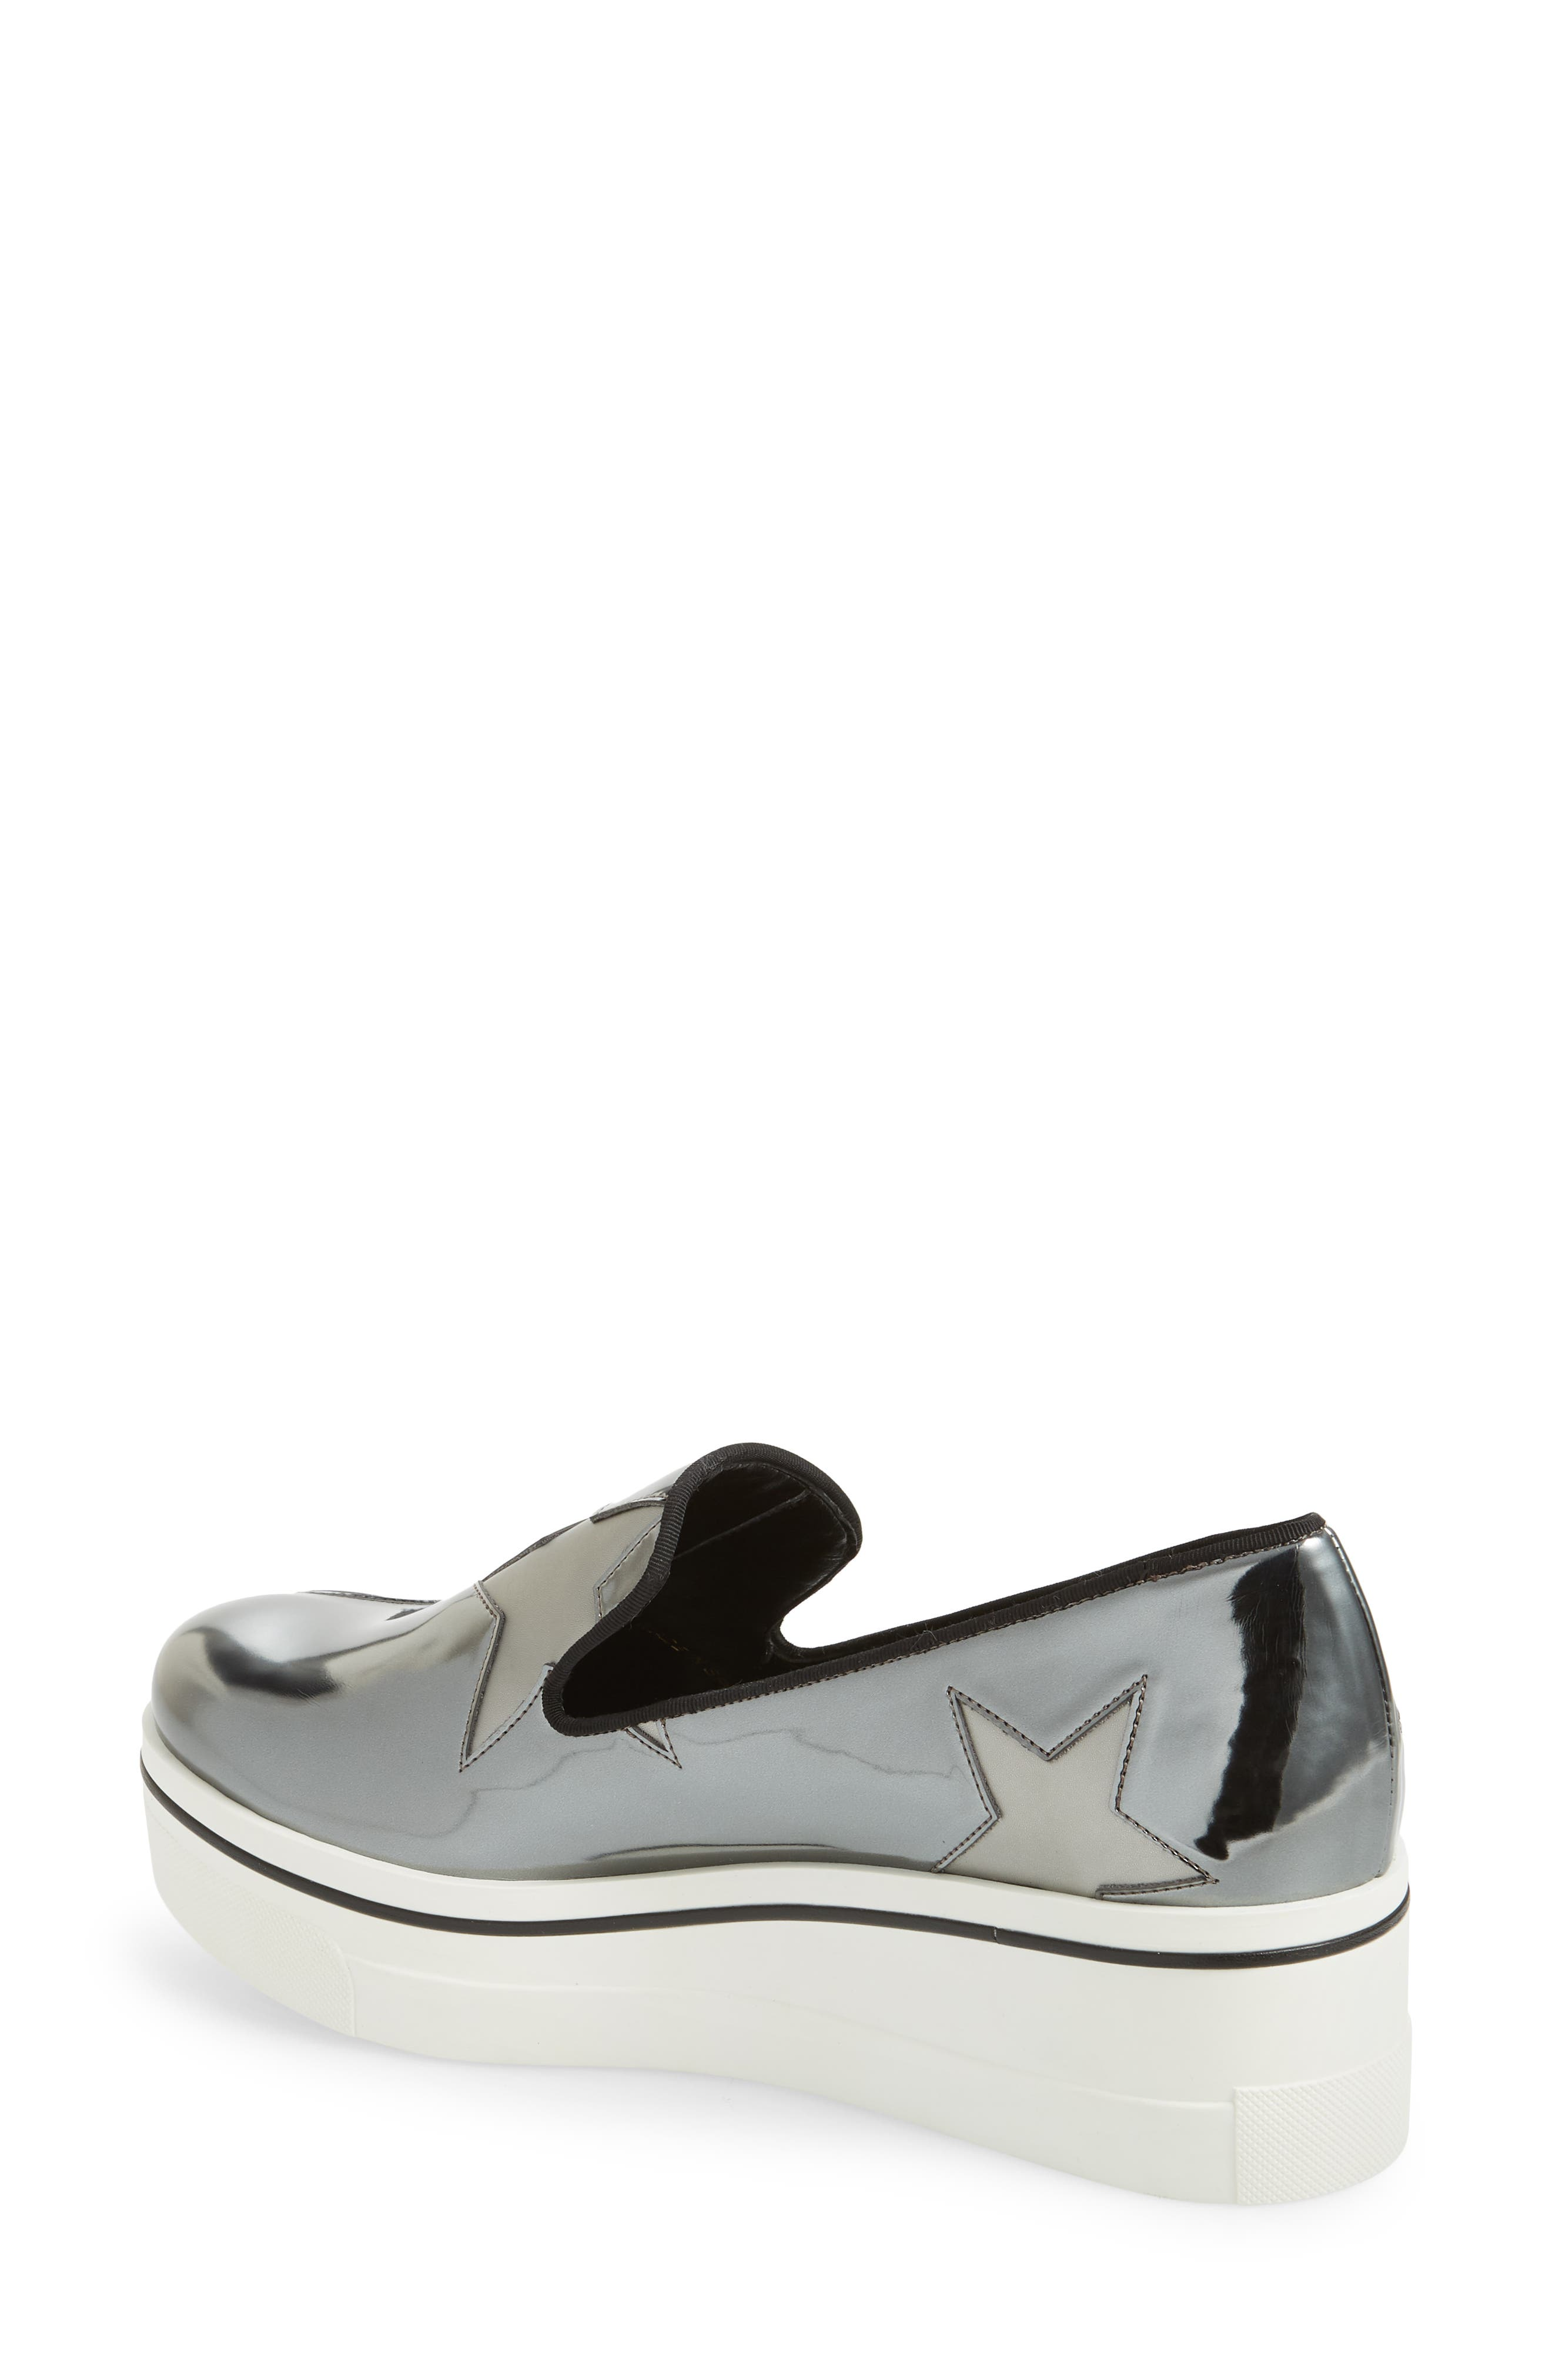 Binx Stars Platform Sneaker,                             Alternate thumbnail 2, color,                             ZINC